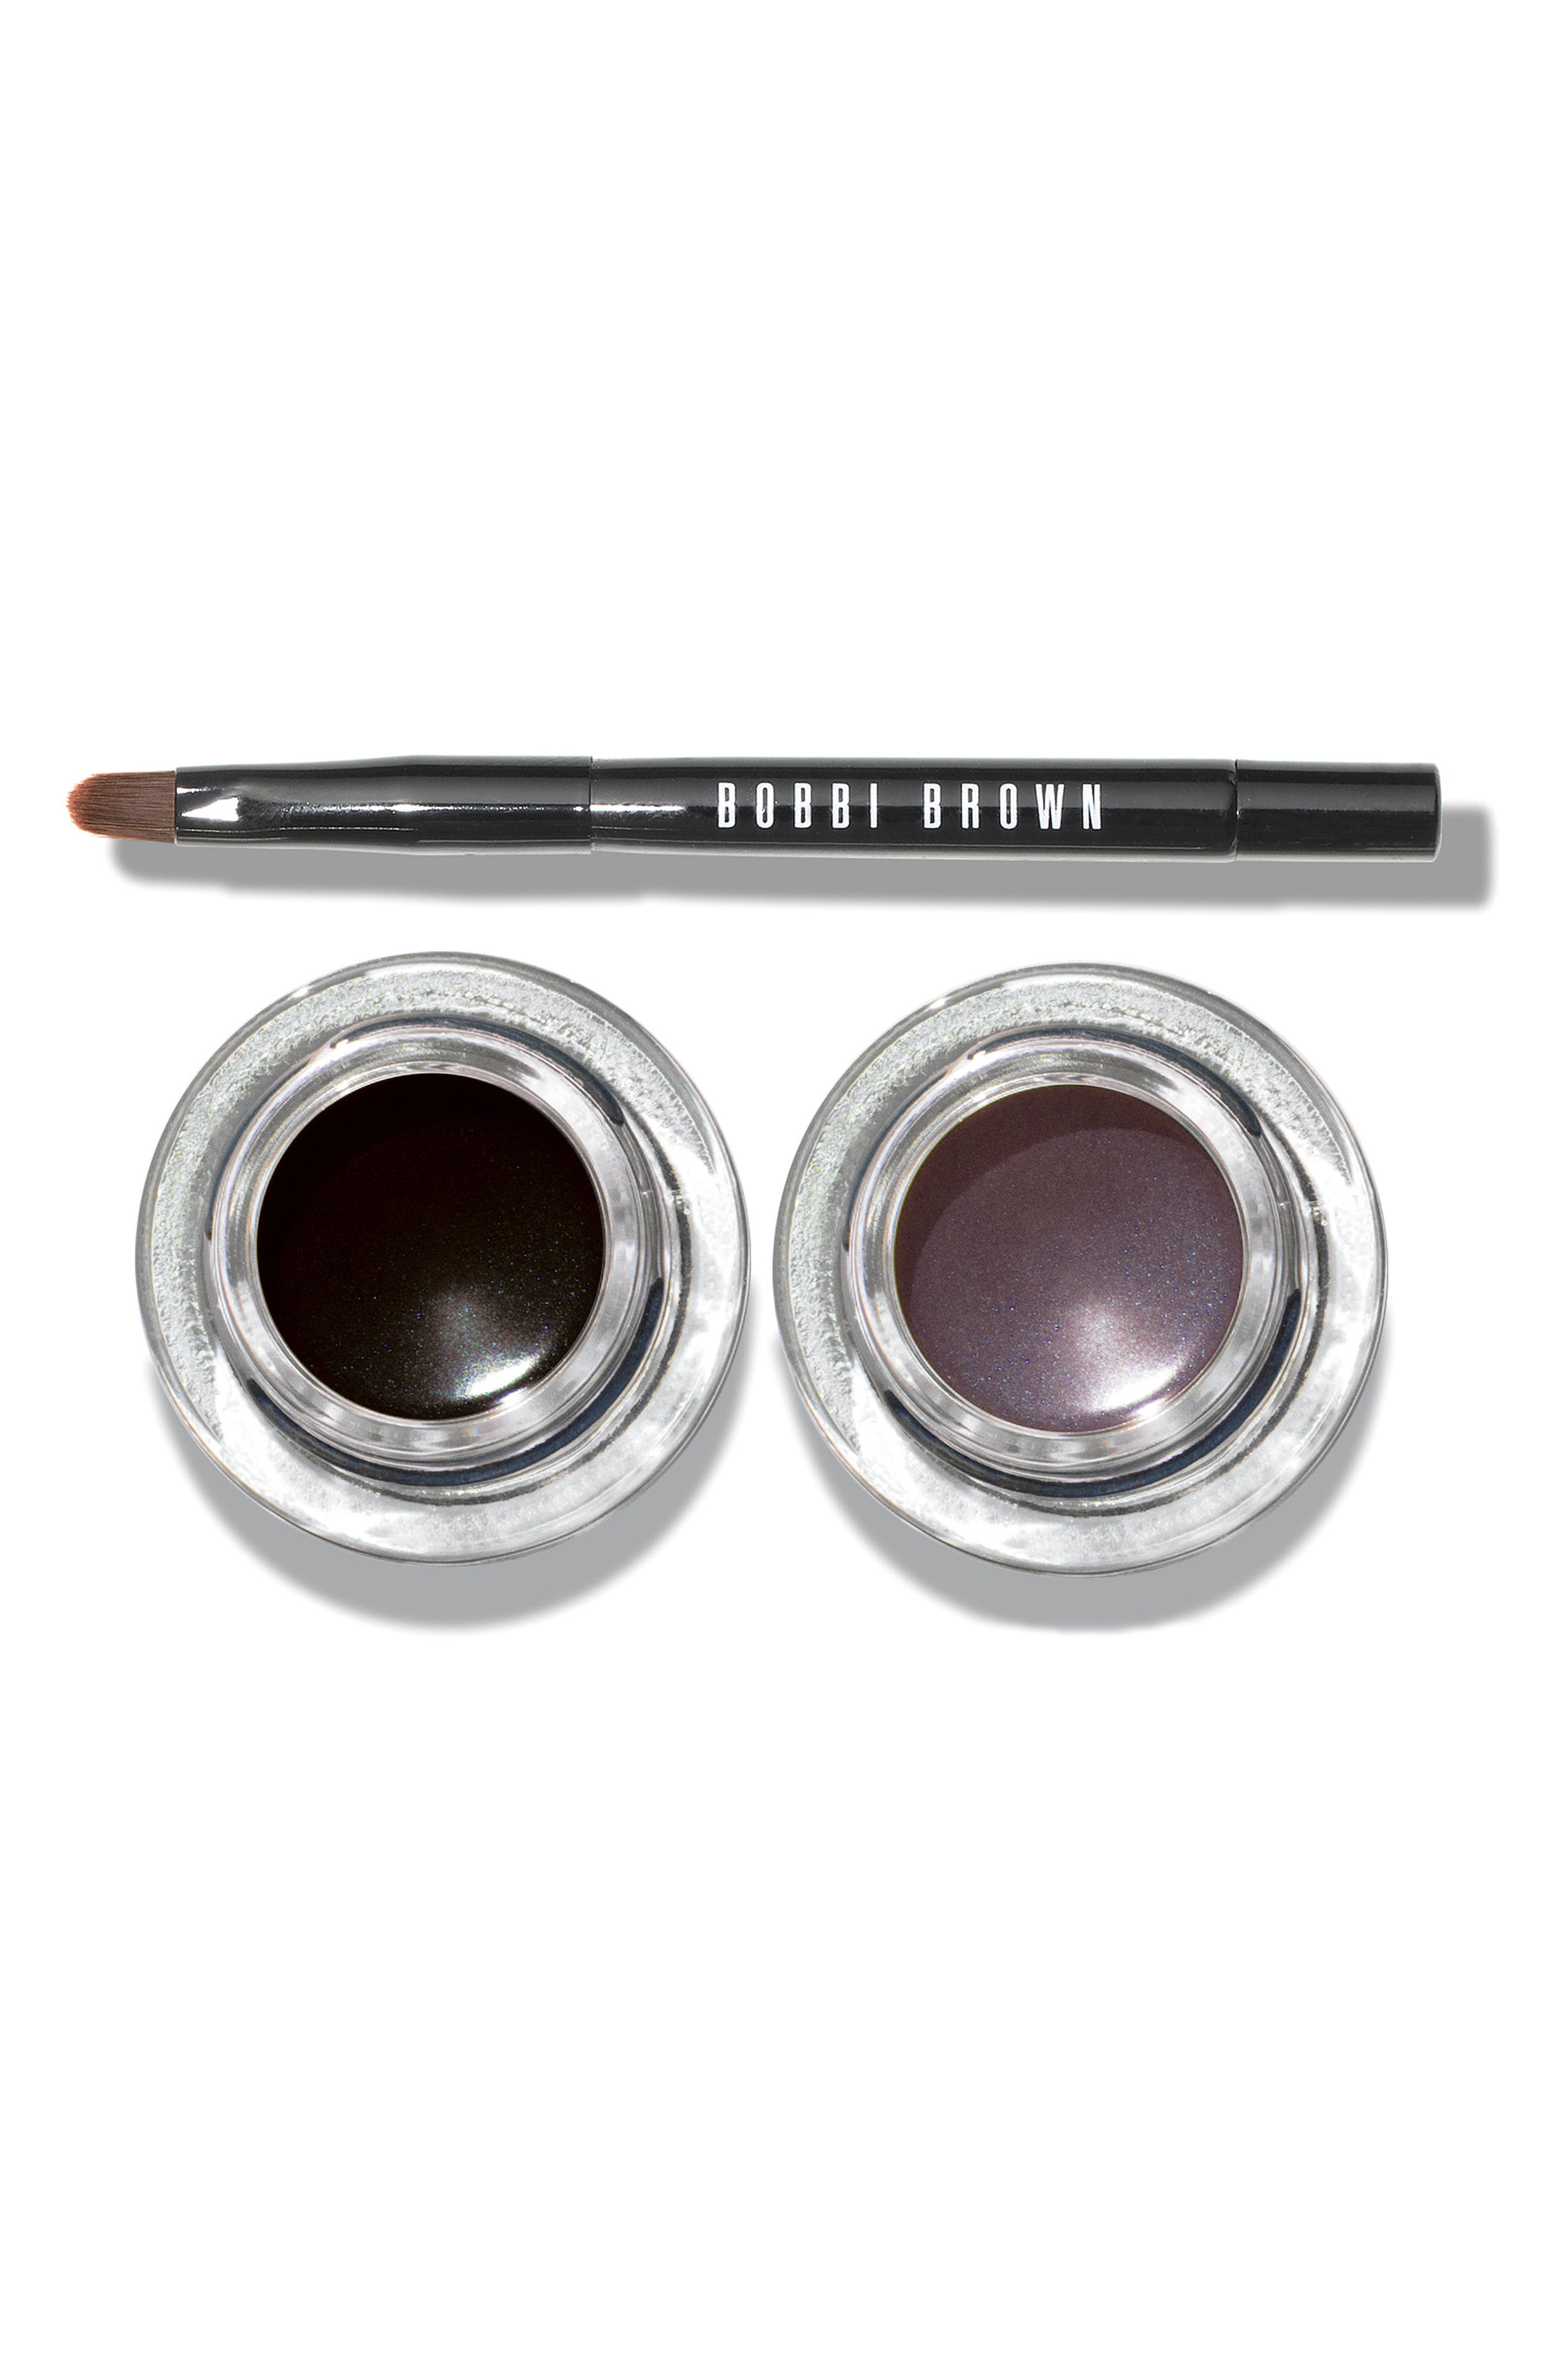 Alternate Image 1 Selected - Bobbi Brown Cat-Eye Long-Wear Gel Eyeliner & Brush Set ($42 Value)